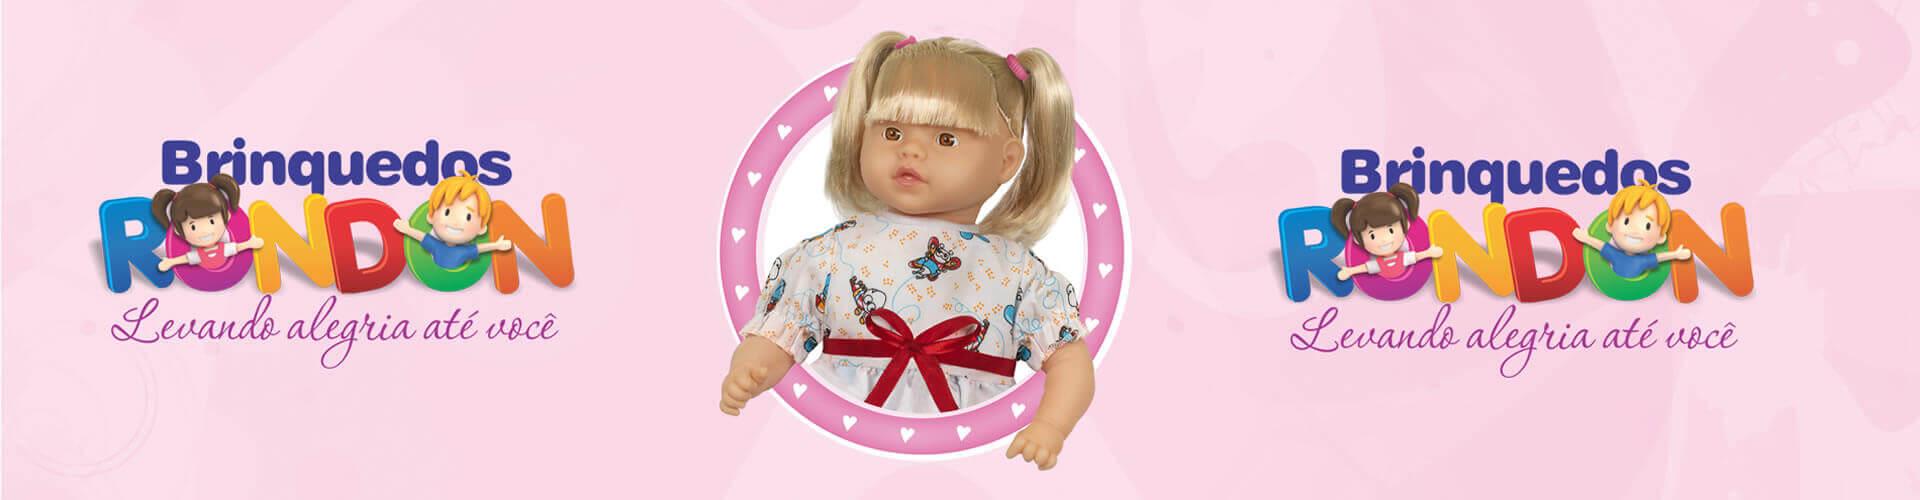 Bonecas, Boneco Bebê